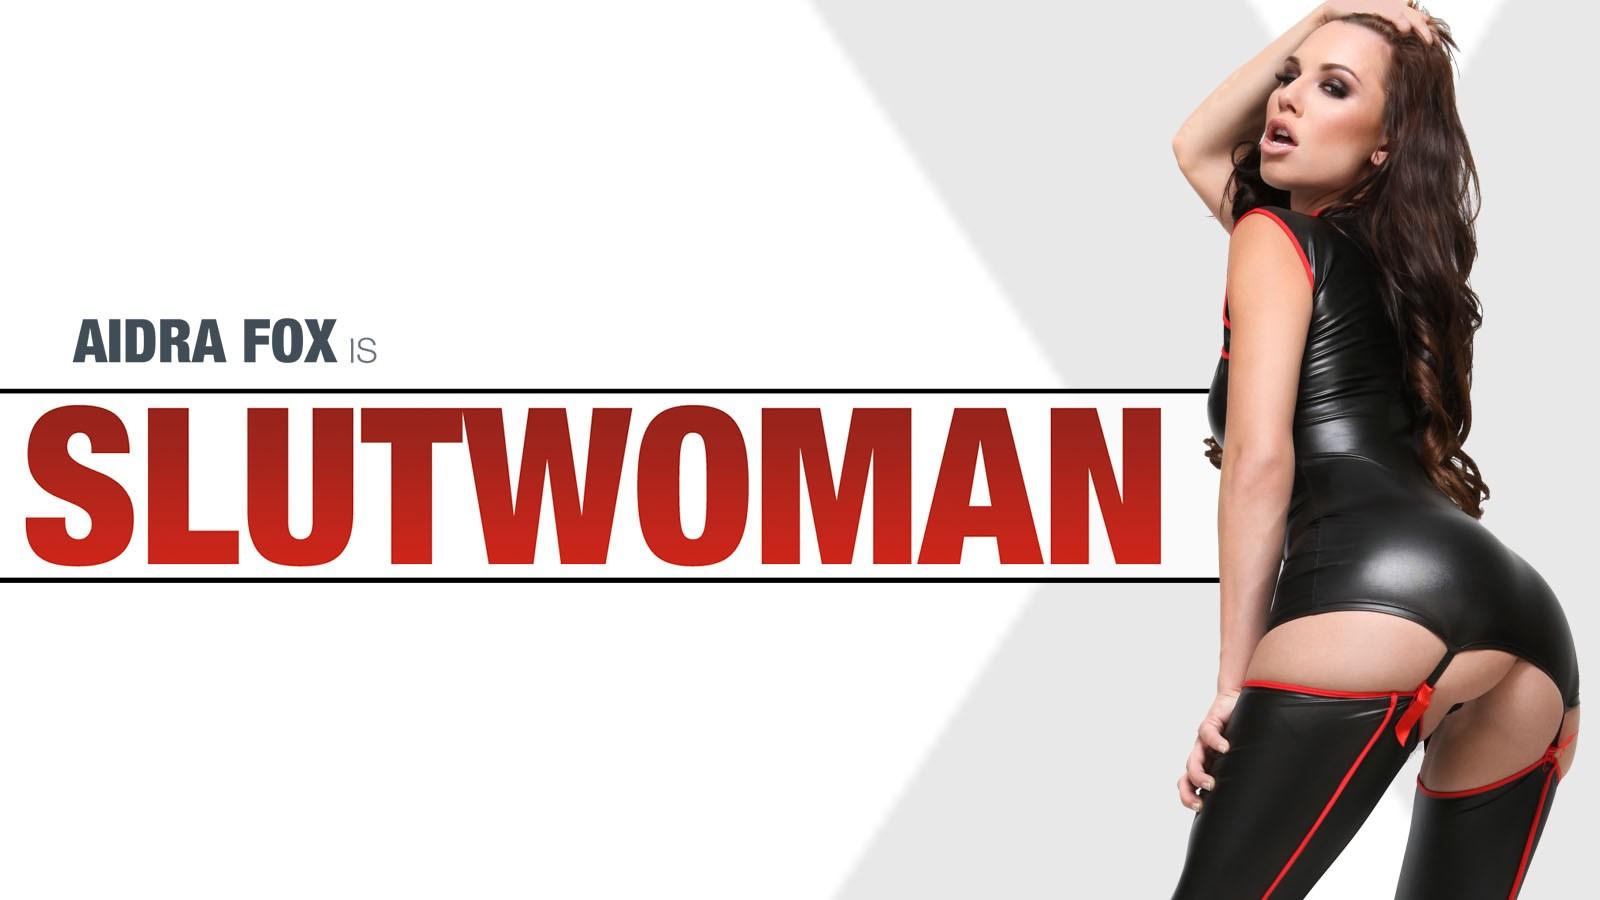 Aidra Fox Is Slutwoman (2015) Dvd